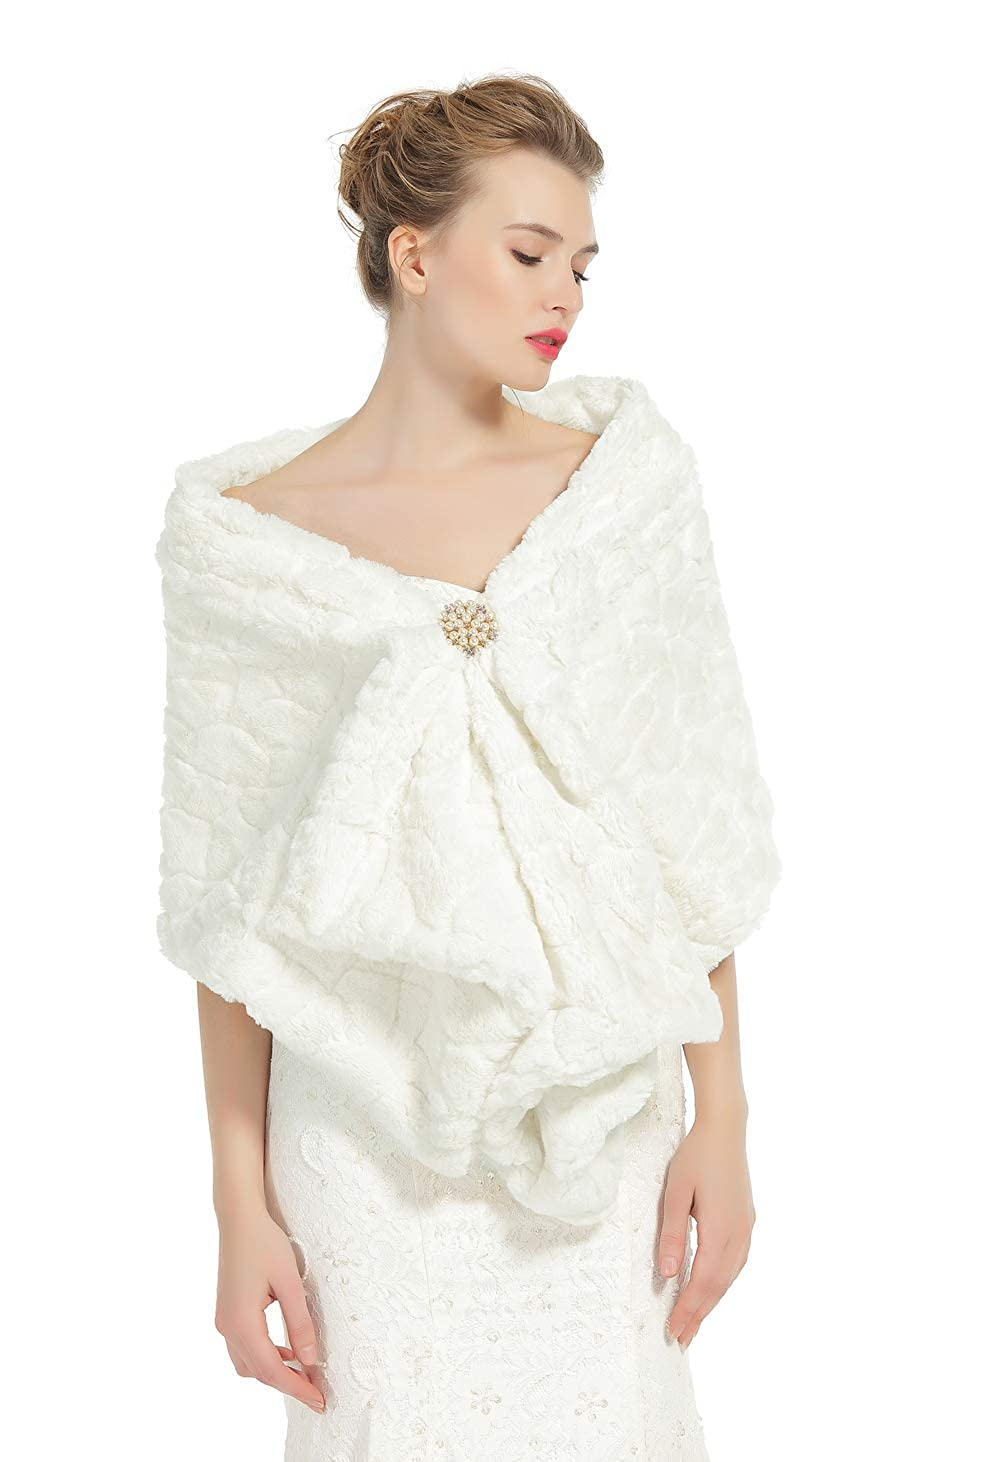 c1ba793cb17be Faux Fur Shawl Wedding Wrap Bridal Shrug Ivory Stole Winter Bridemaids  Cover Up 3 Patterns Free Brooch  Amazon.co.uk  Clothing